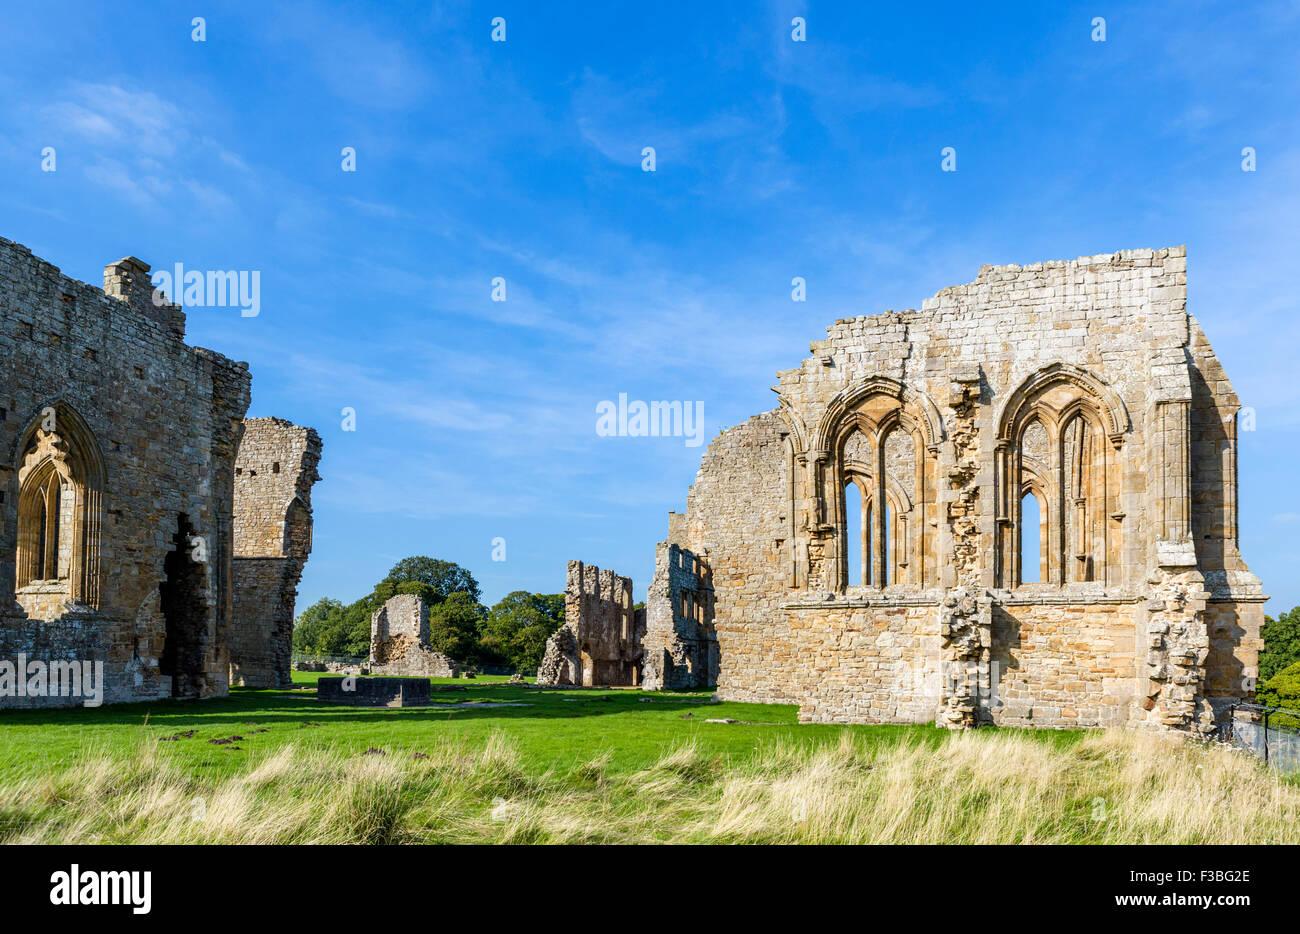 The 12thC Premonstratensian Egglestone Abbey, near Barnard Castle, County Durham, England, UK - Stock Image